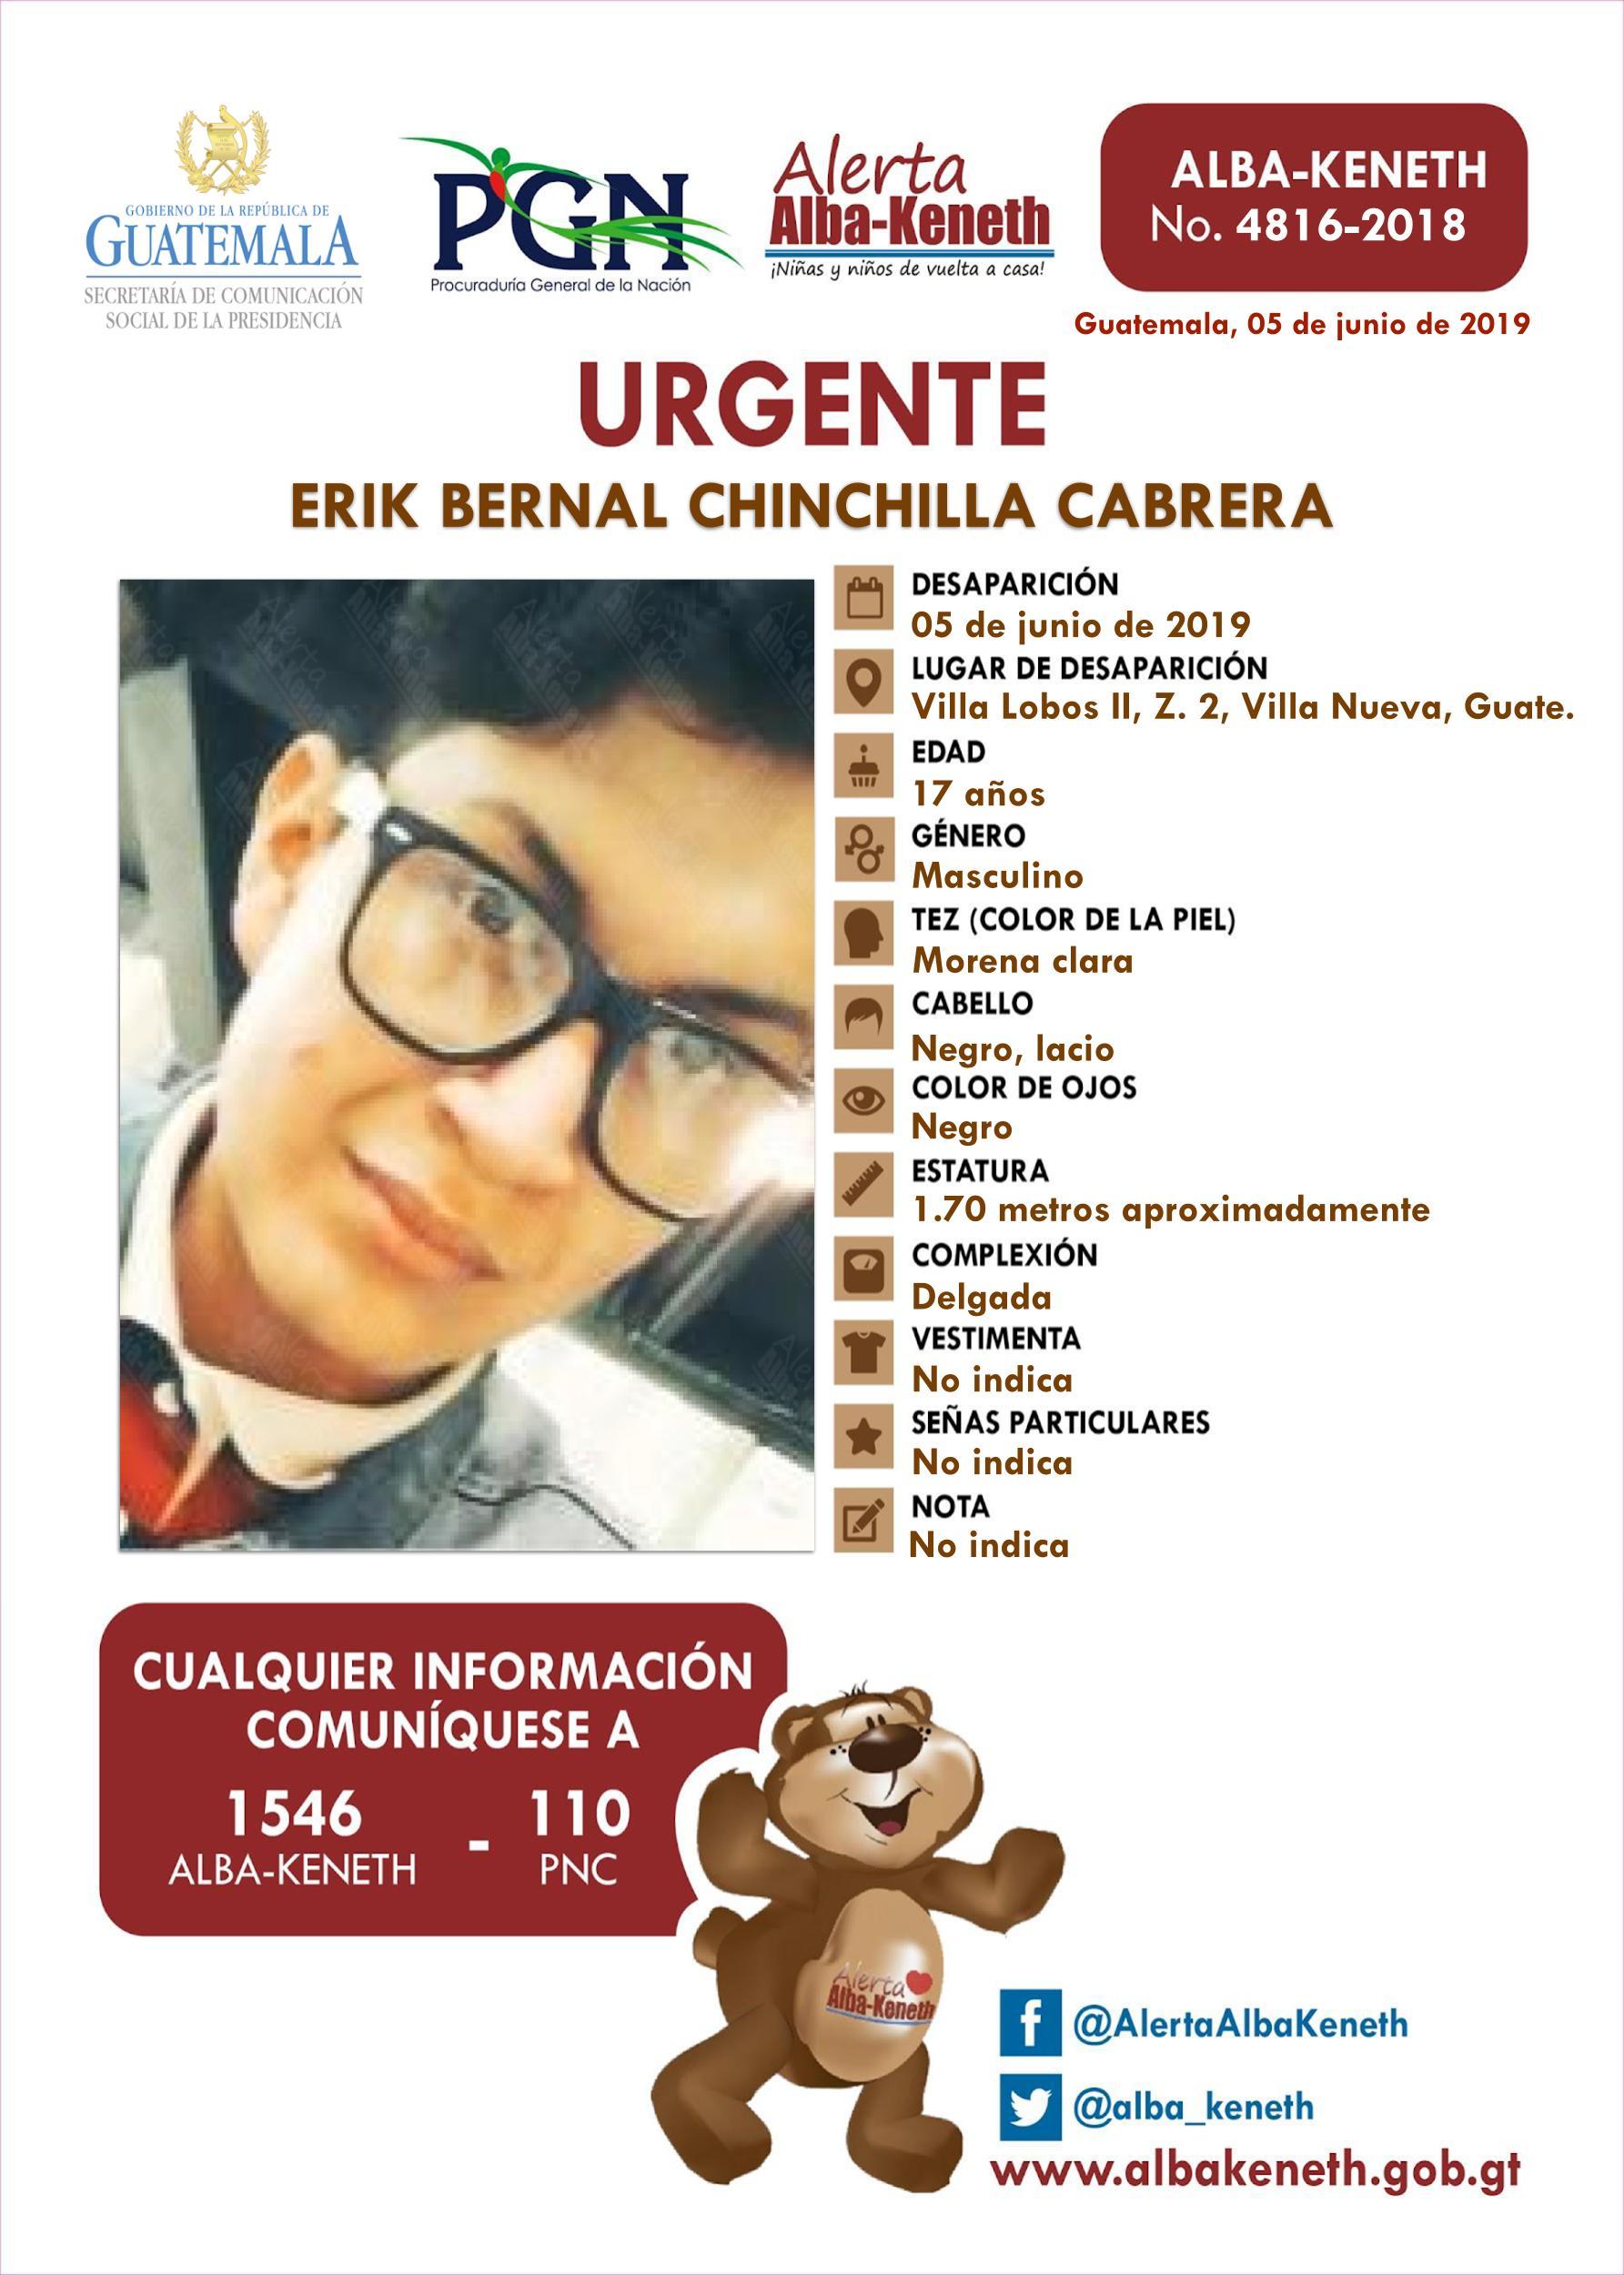 Erik Bernal Chinchilla Cabrera